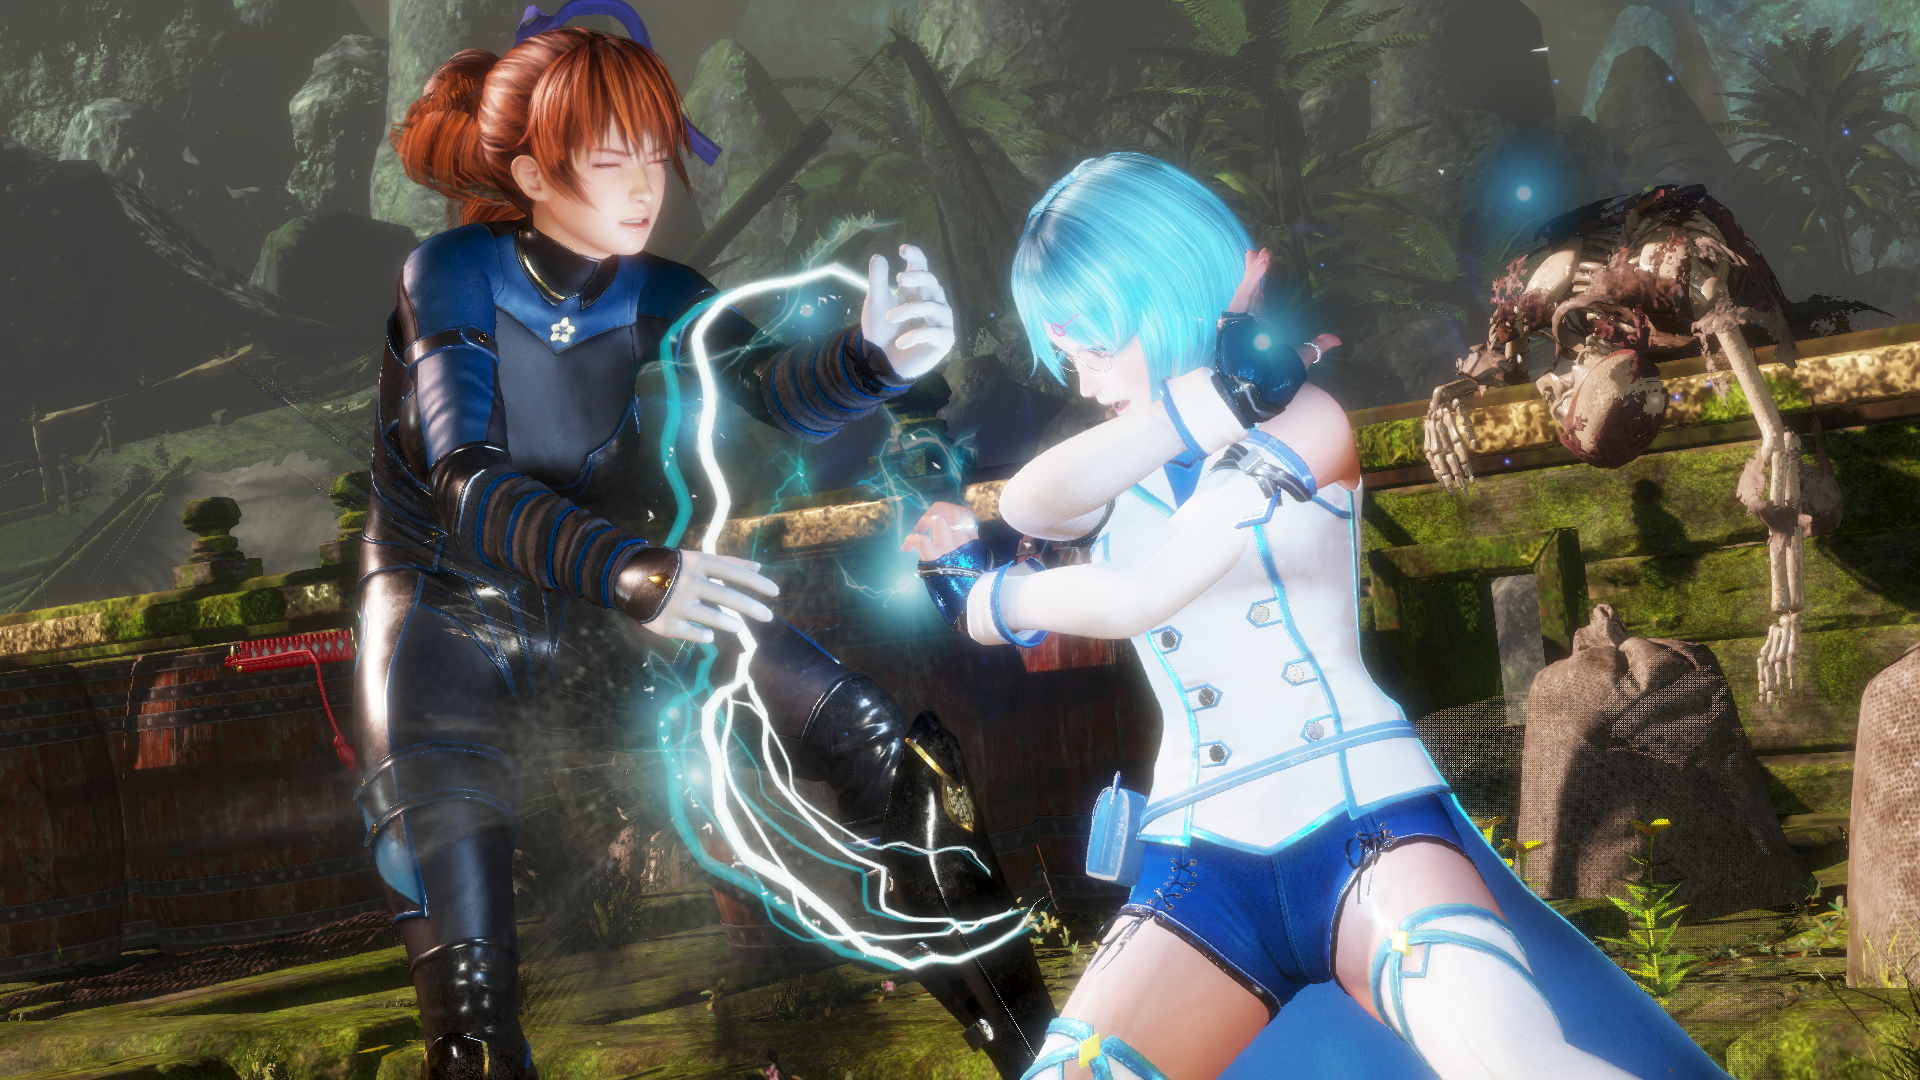 katsumi vs nico dead or alive 6 review